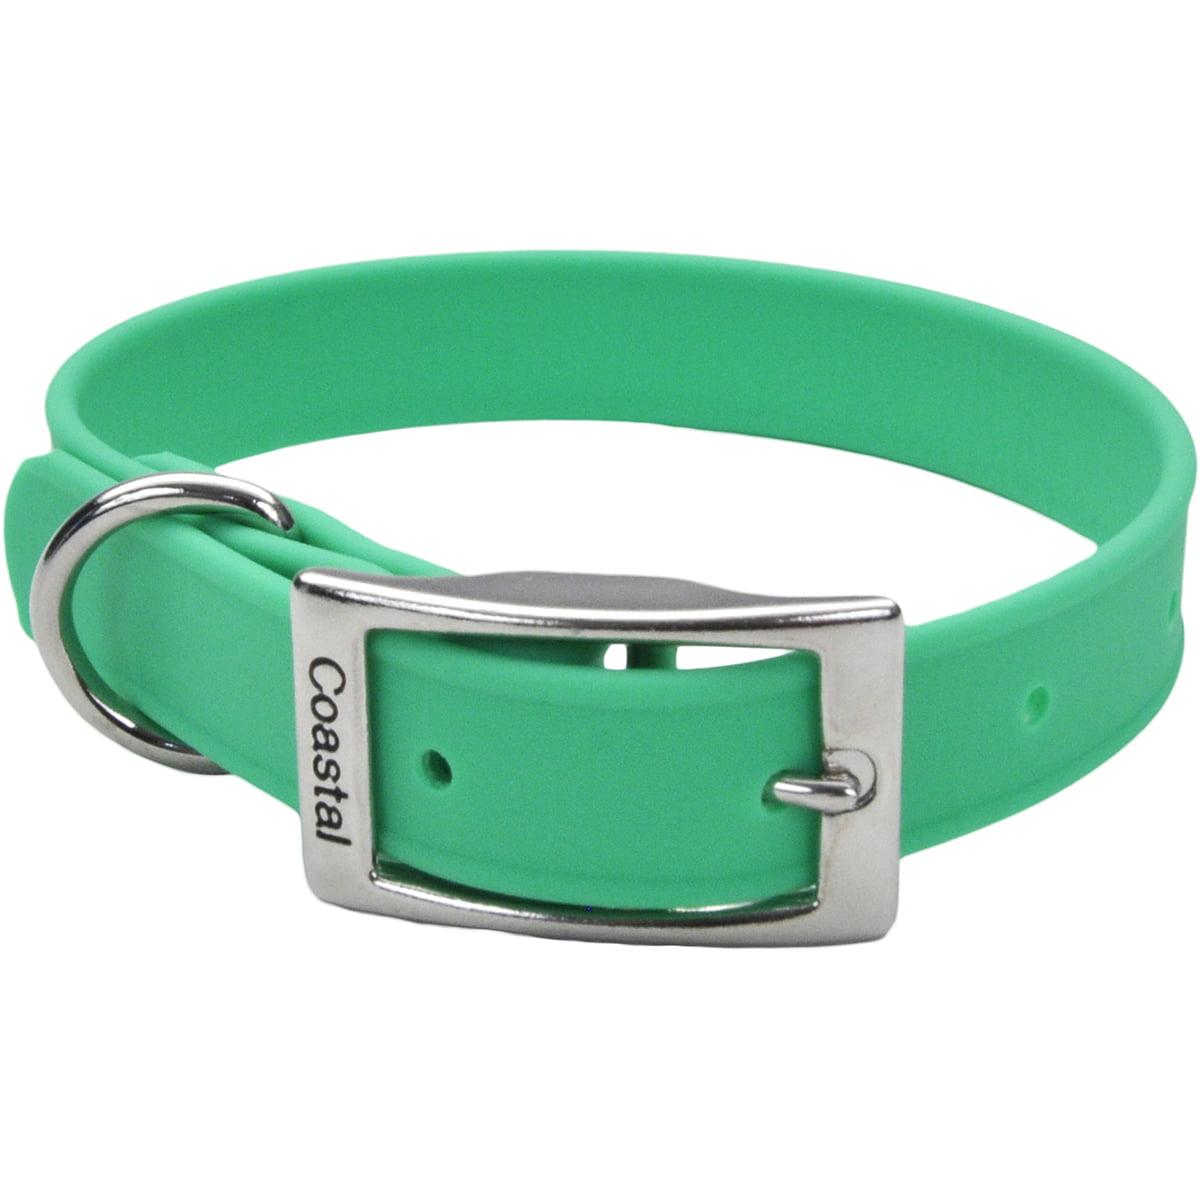 "Coastal 14"" Waterproof Dog Collar-Green - image 1 of 1"